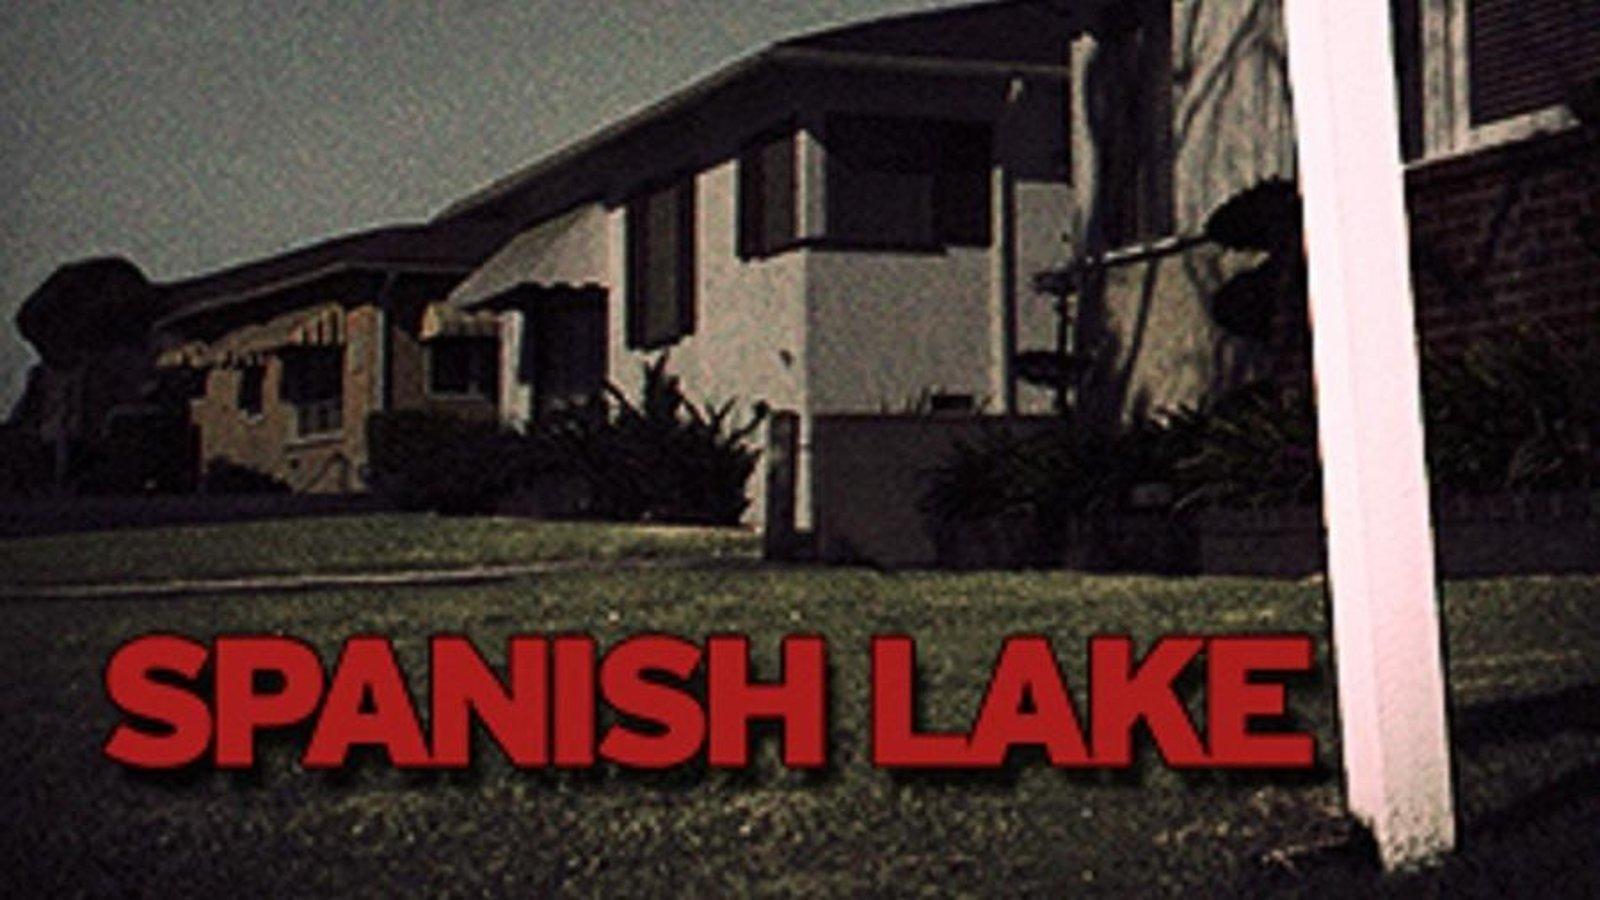 Spanish Lake - Political and Economic Oppression in Missouri